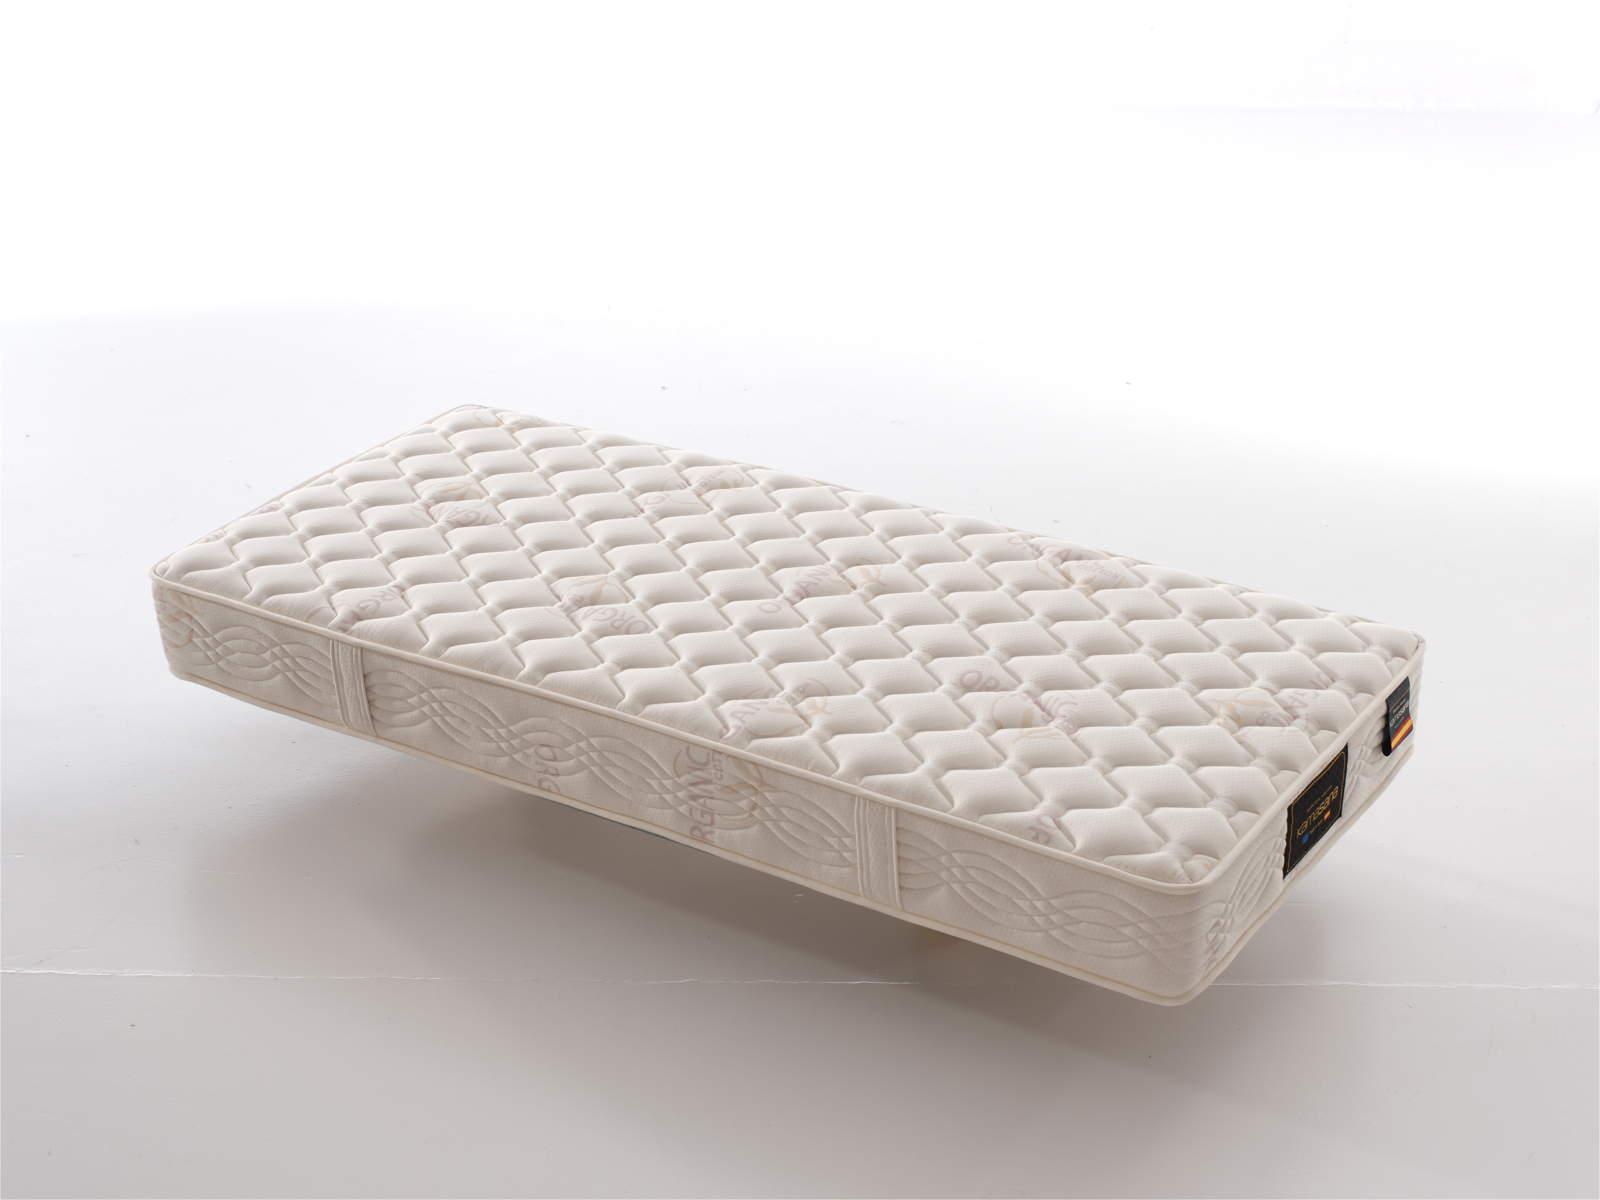 Матрас Kamasana Relaxcomfort